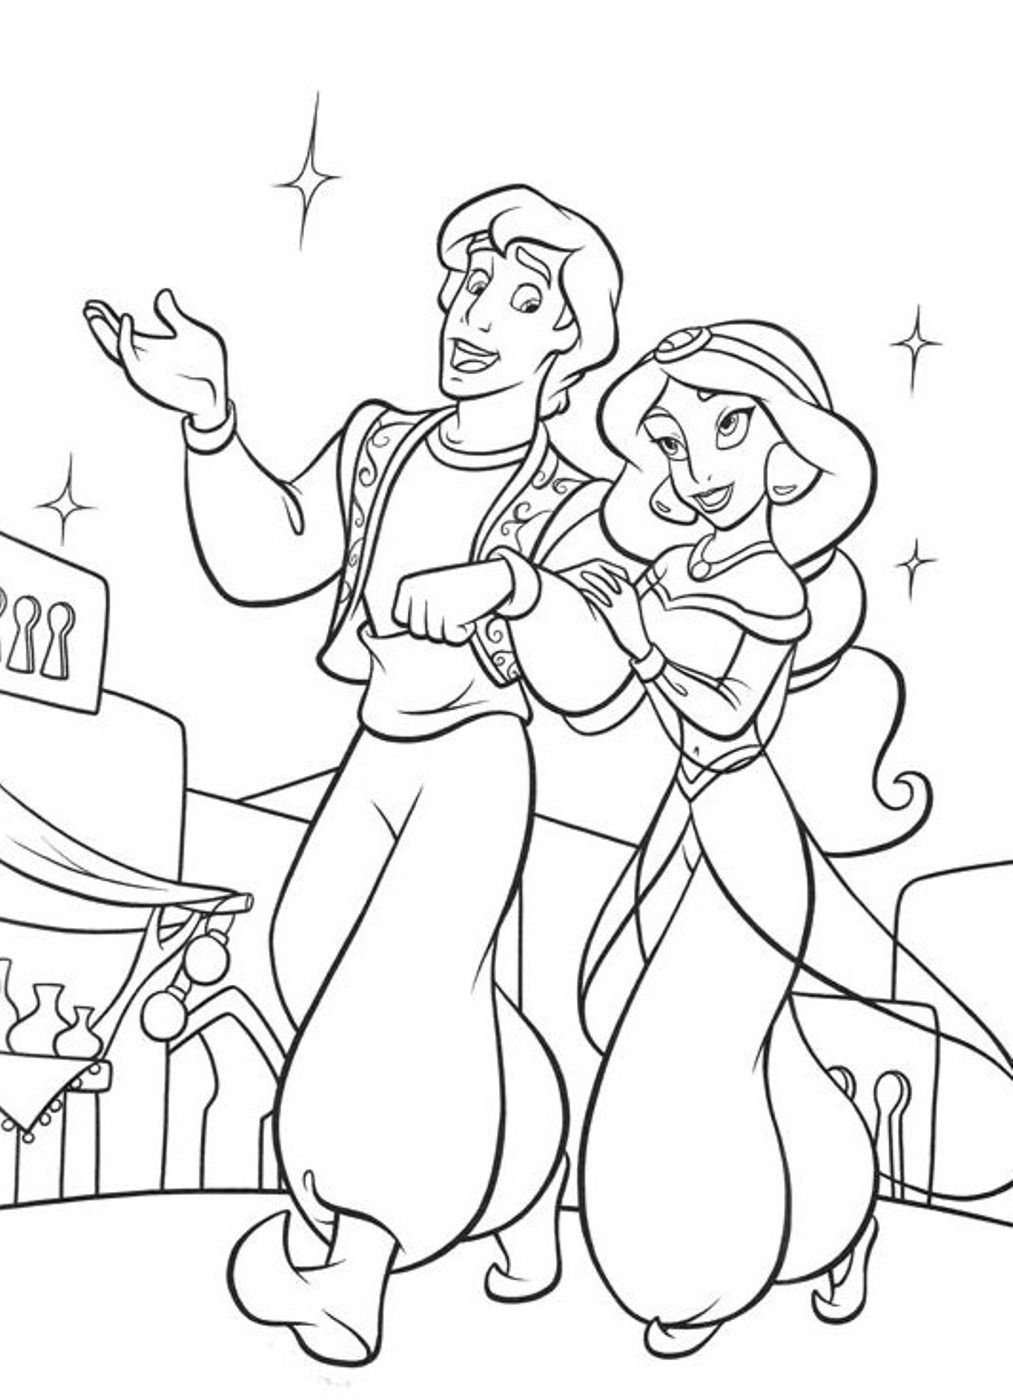 Pin Van Jen Cid Op Disney Coloring Pages Games Kleurplaten Prinses Kleurplaatjes Kleurplaten Voor Kinderen